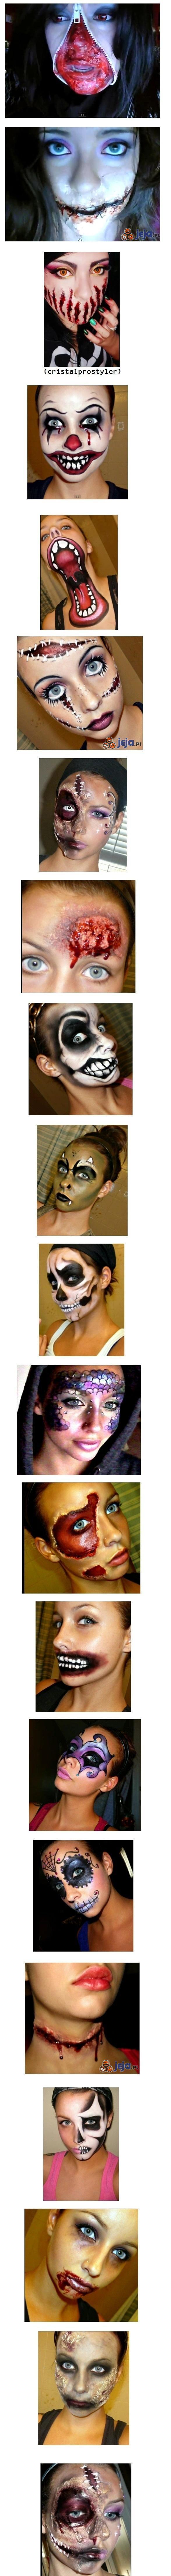 Makabryczny make-up